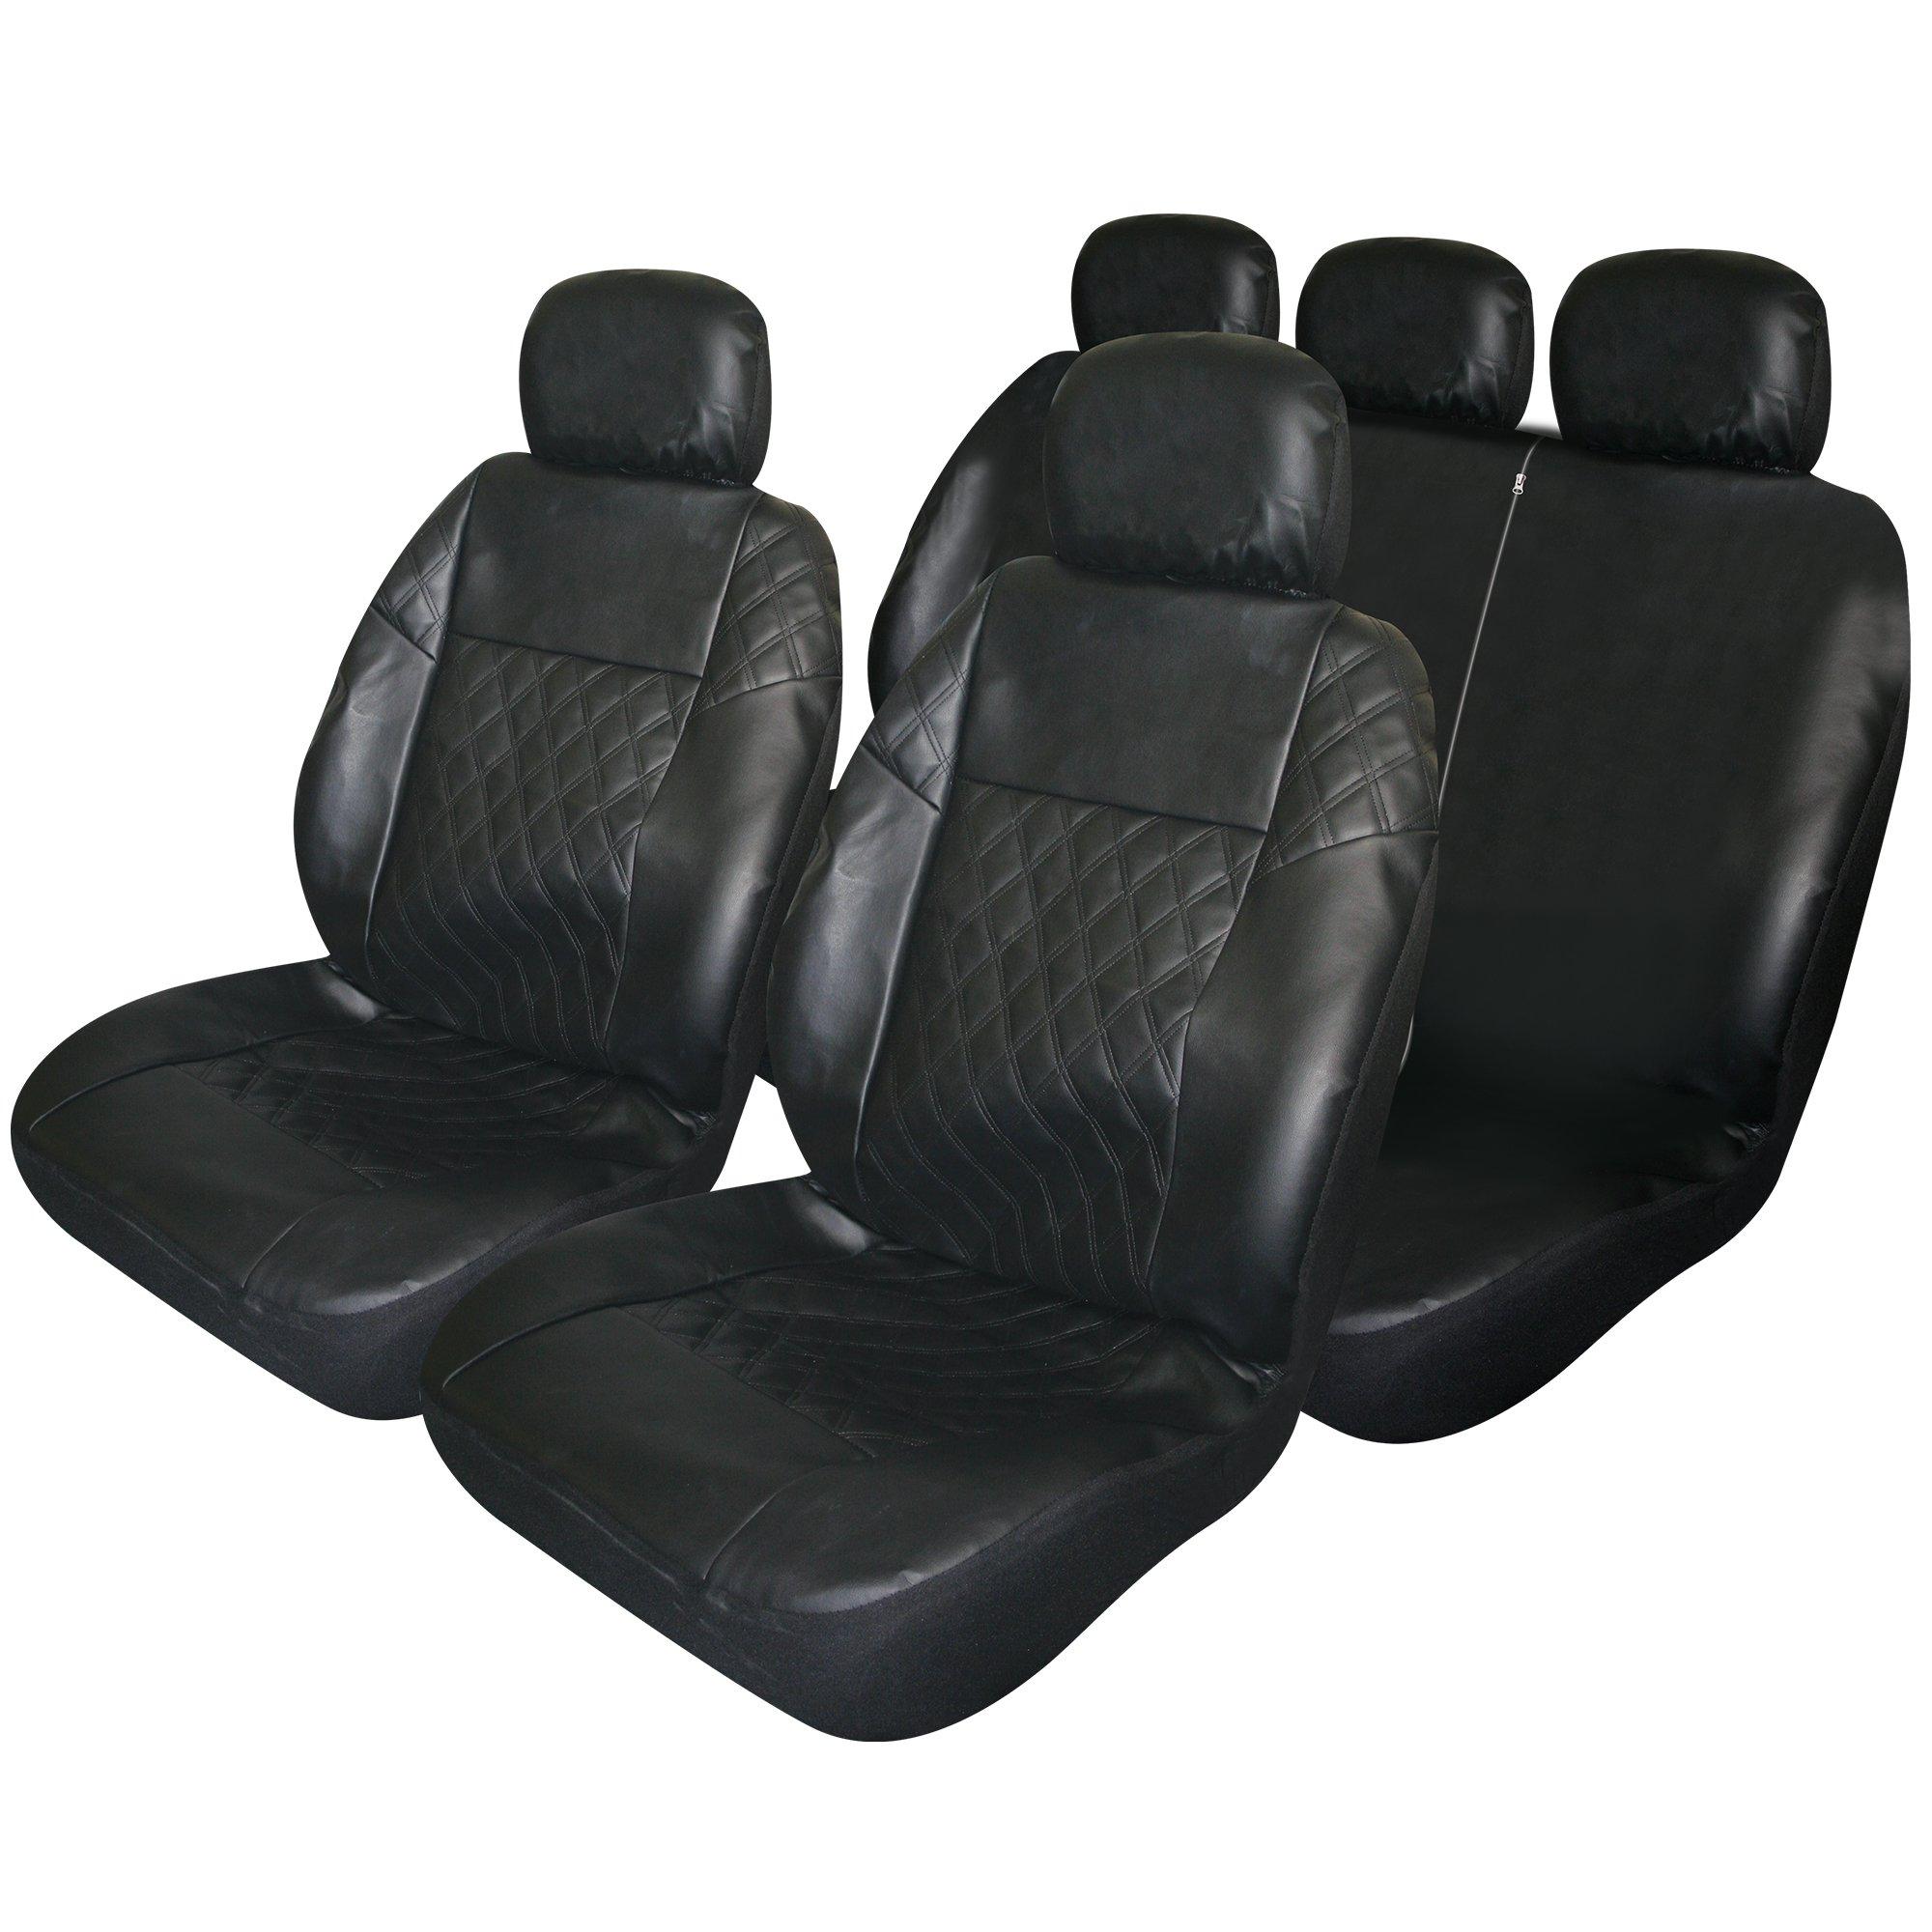 Terrific Details About Masque Black Diamond Pattern Seat Cover Set 67217 Creativecarmelina Interior Chair Design Creativecarmelinacom